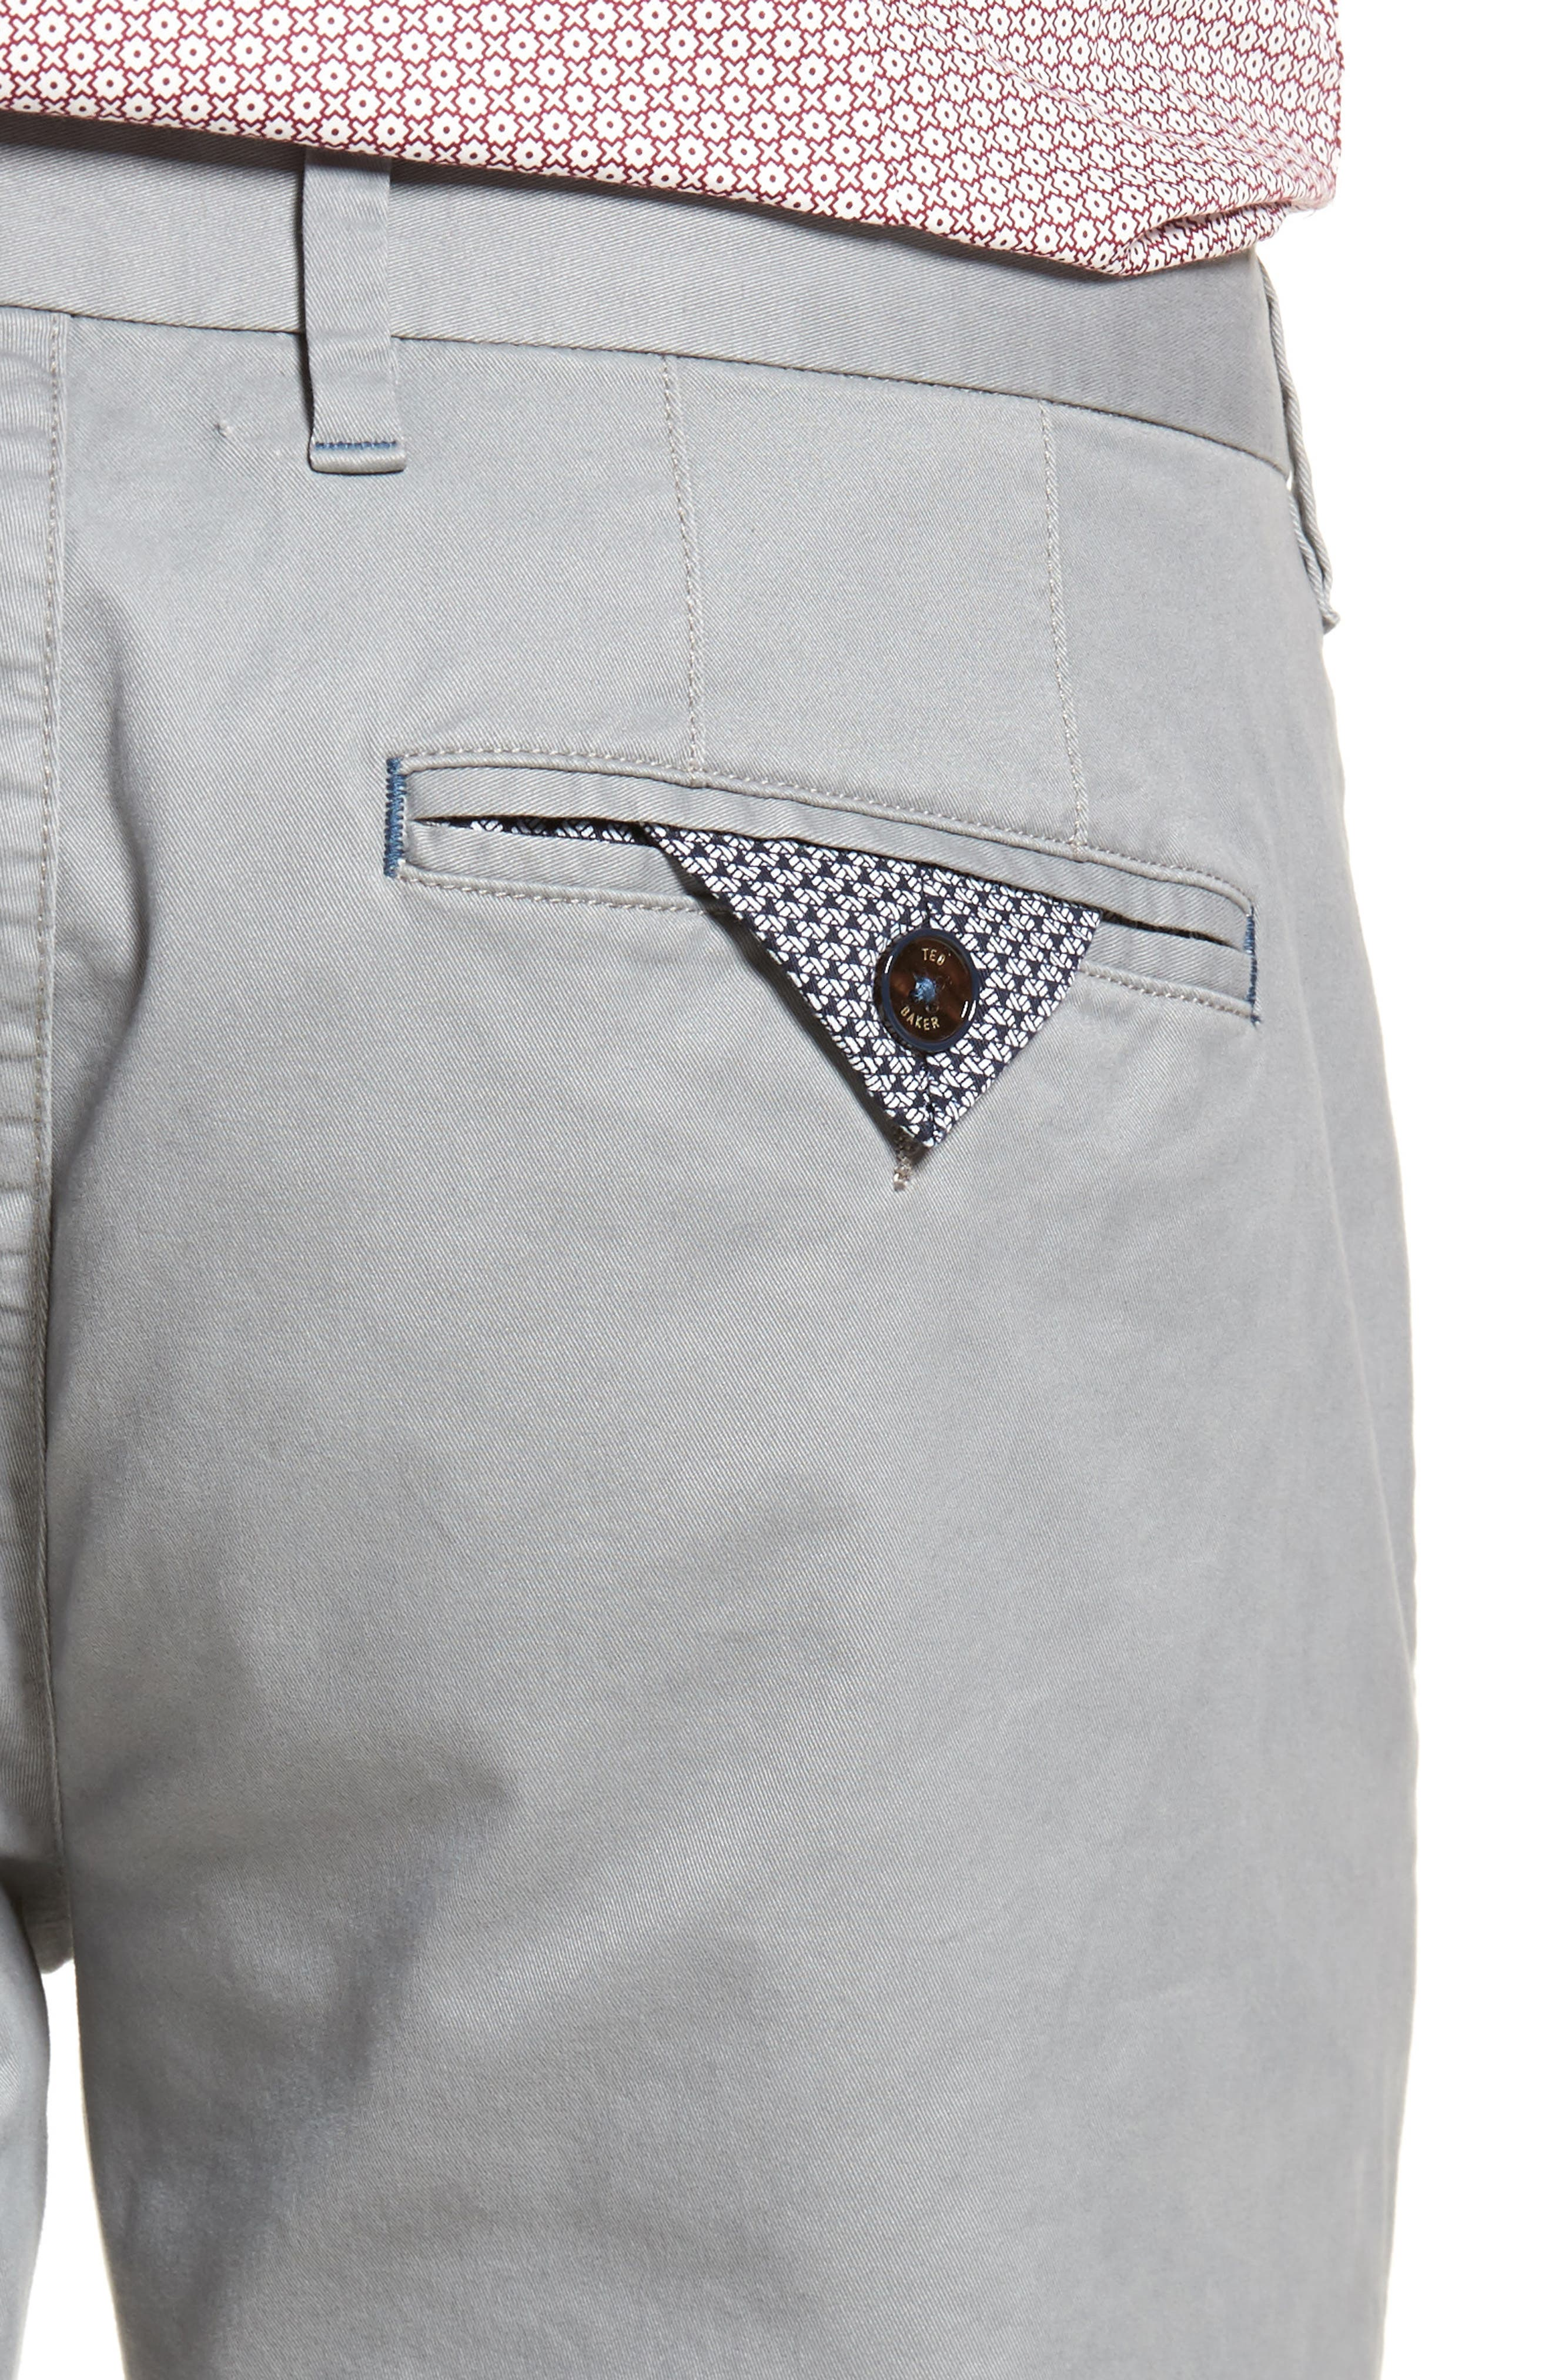 Proctt Flat Front Stretch Solid Cotton Pants,                             Alternate thumbnail 4, color,                             Light Grey